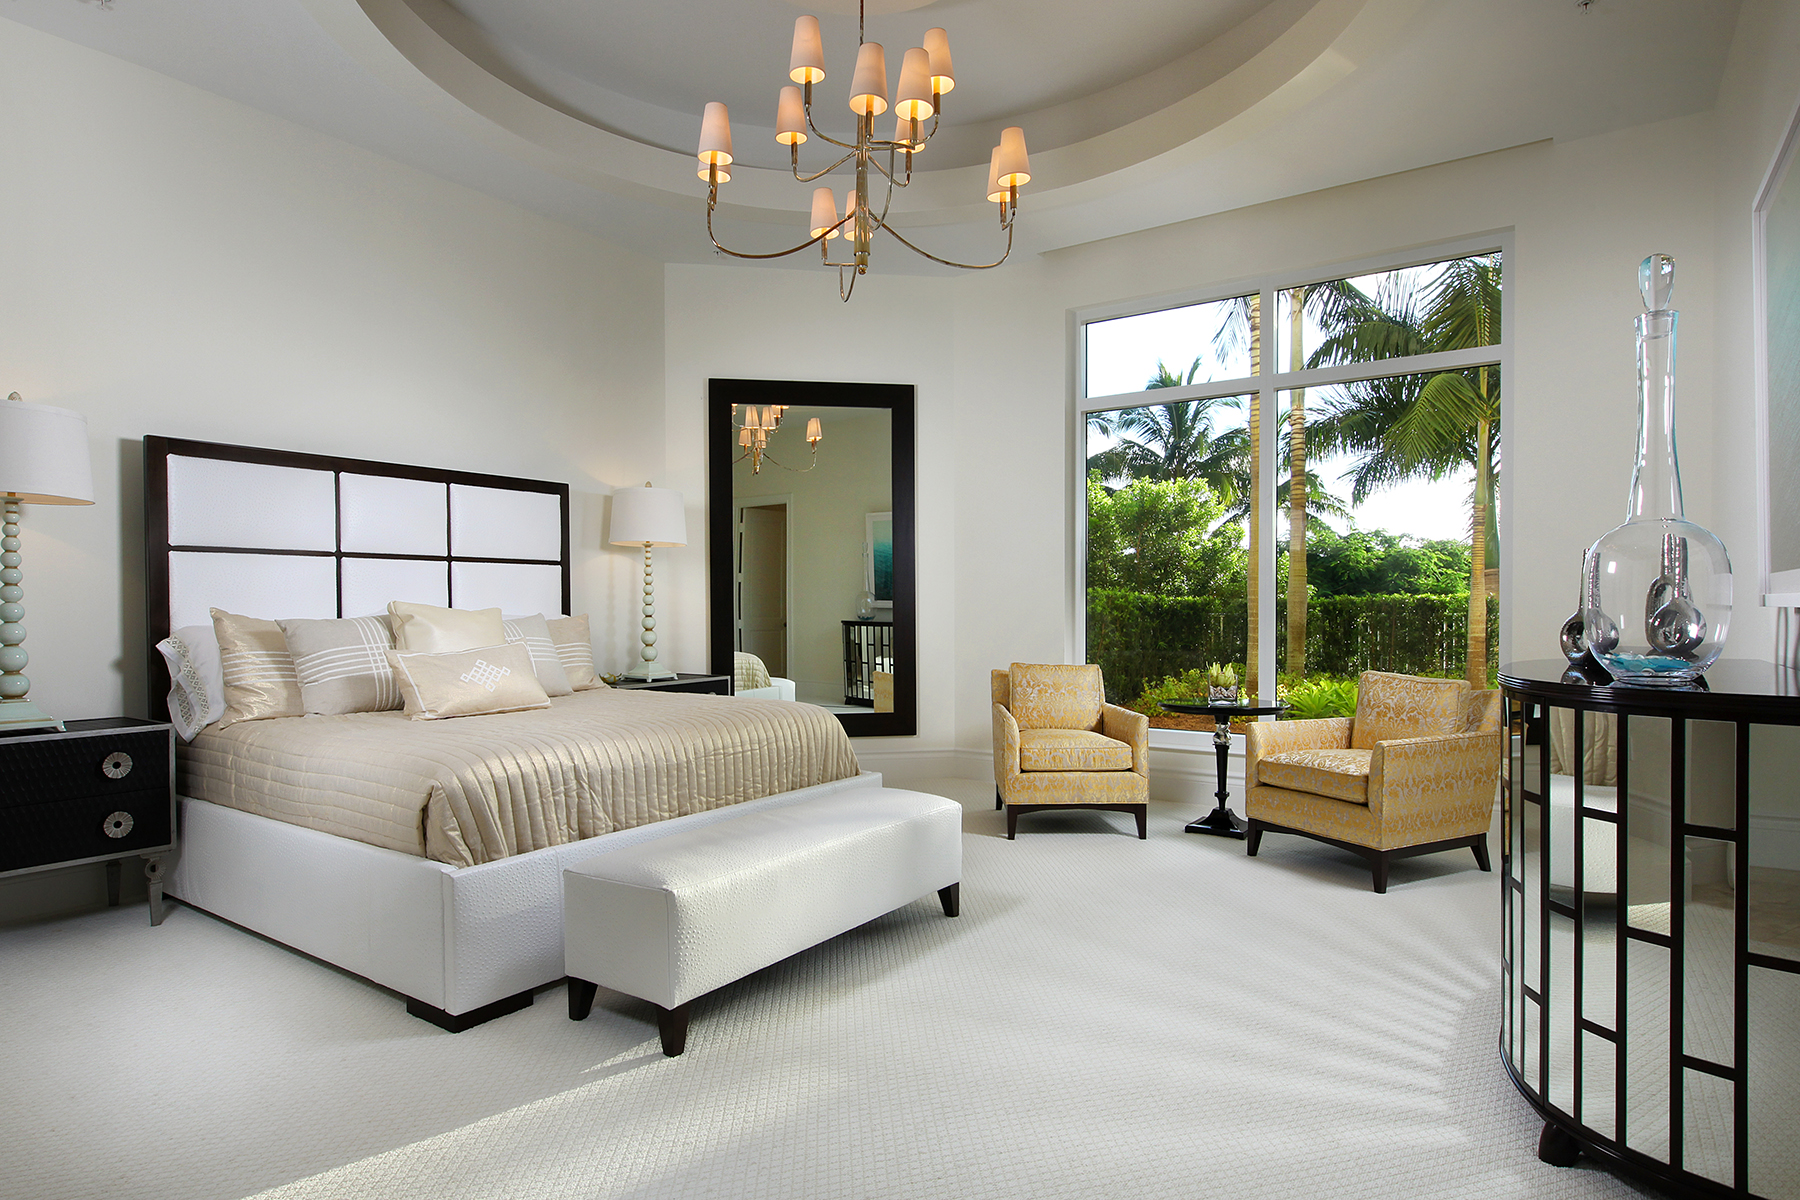 Additional photo for property listing at Naples 13675  Vanderbilt Dr 210,  Naples, Florida 34110 United States